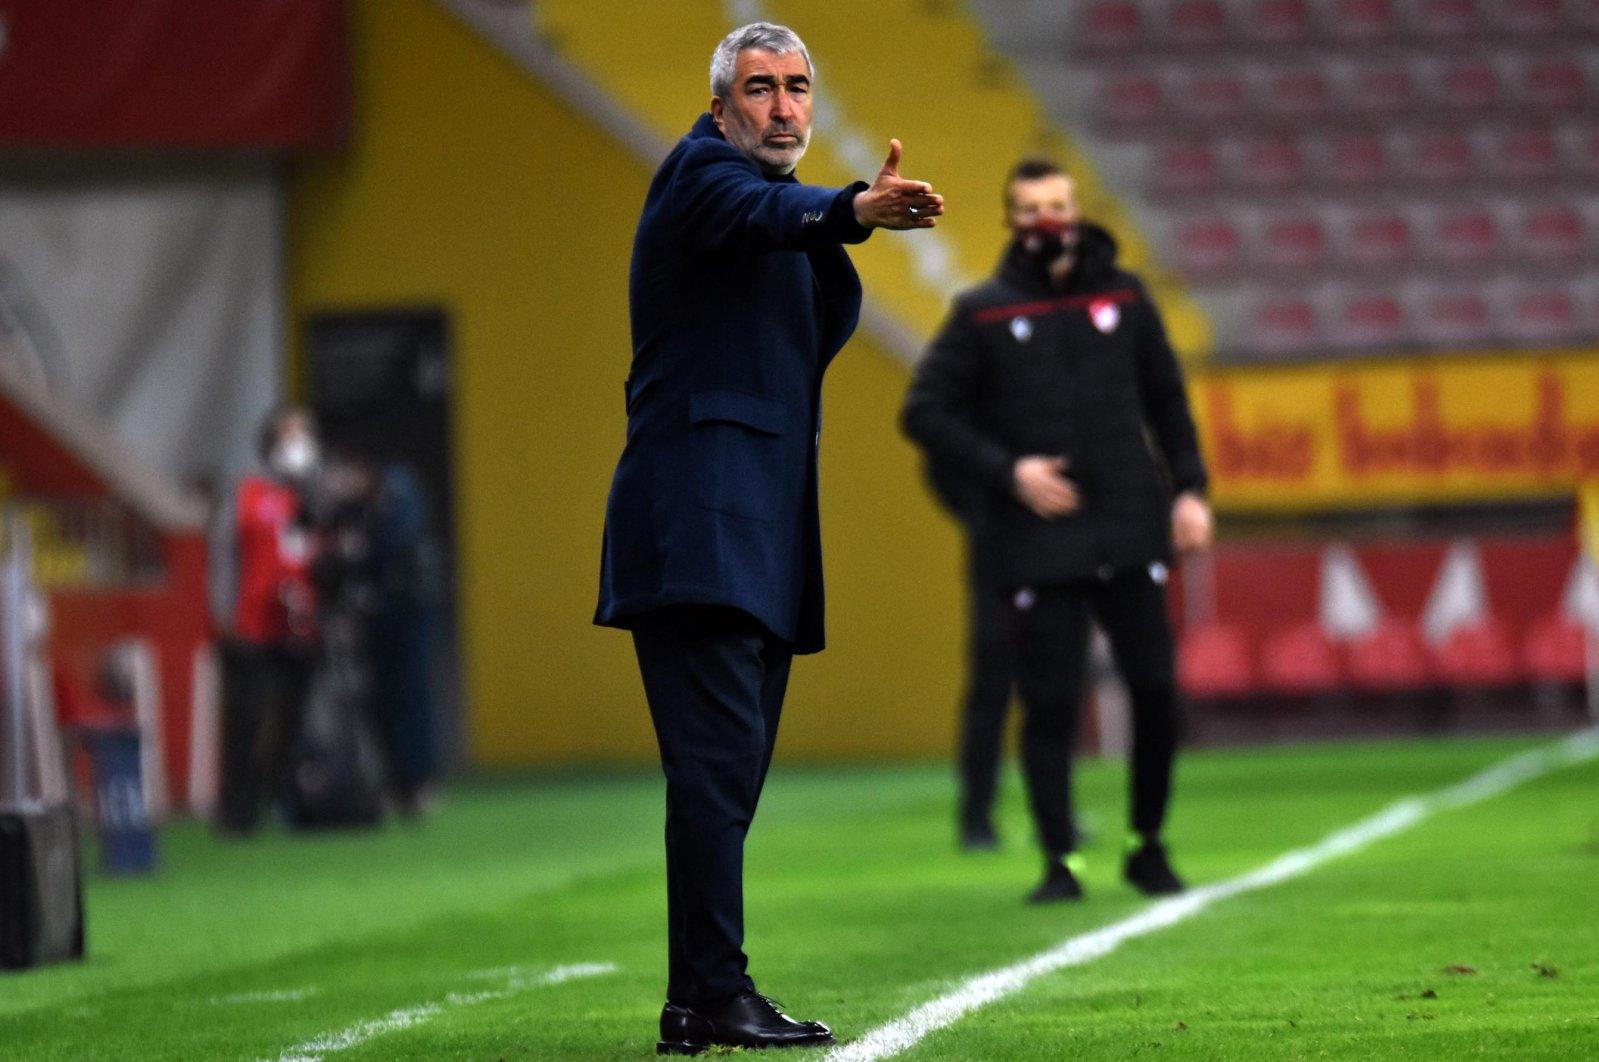 Coach Samet Aybaba reacts during a Süper Lig match against Beşiktaş, in Kayseri, Turkey, Jan. 3, 2021. (AA Photo)